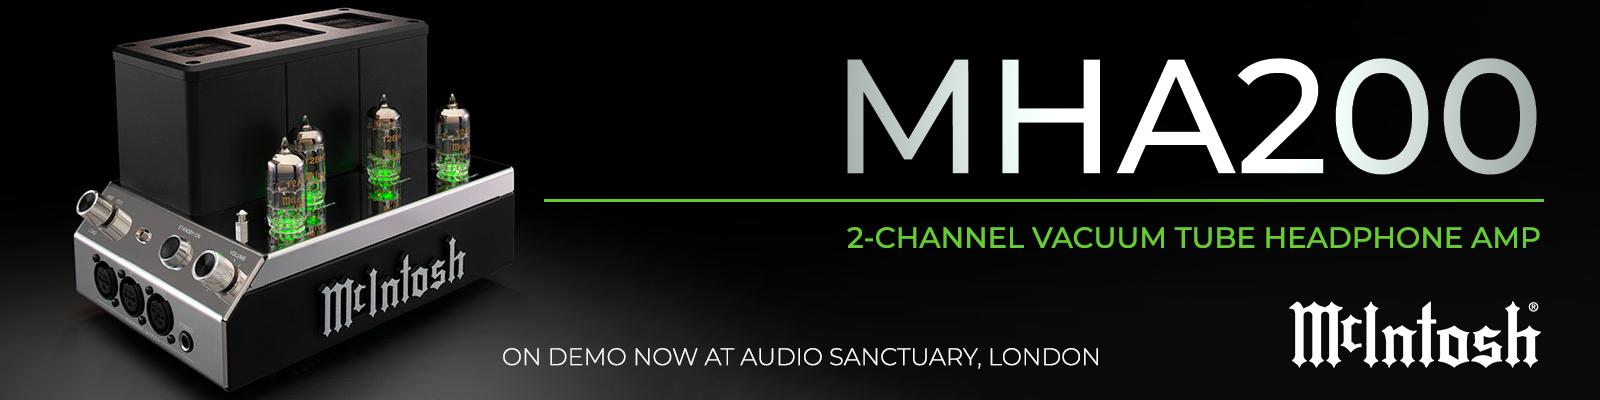 MHA200 2-Channel Vacuum Tunbe Headphone Amp, by McIntosh